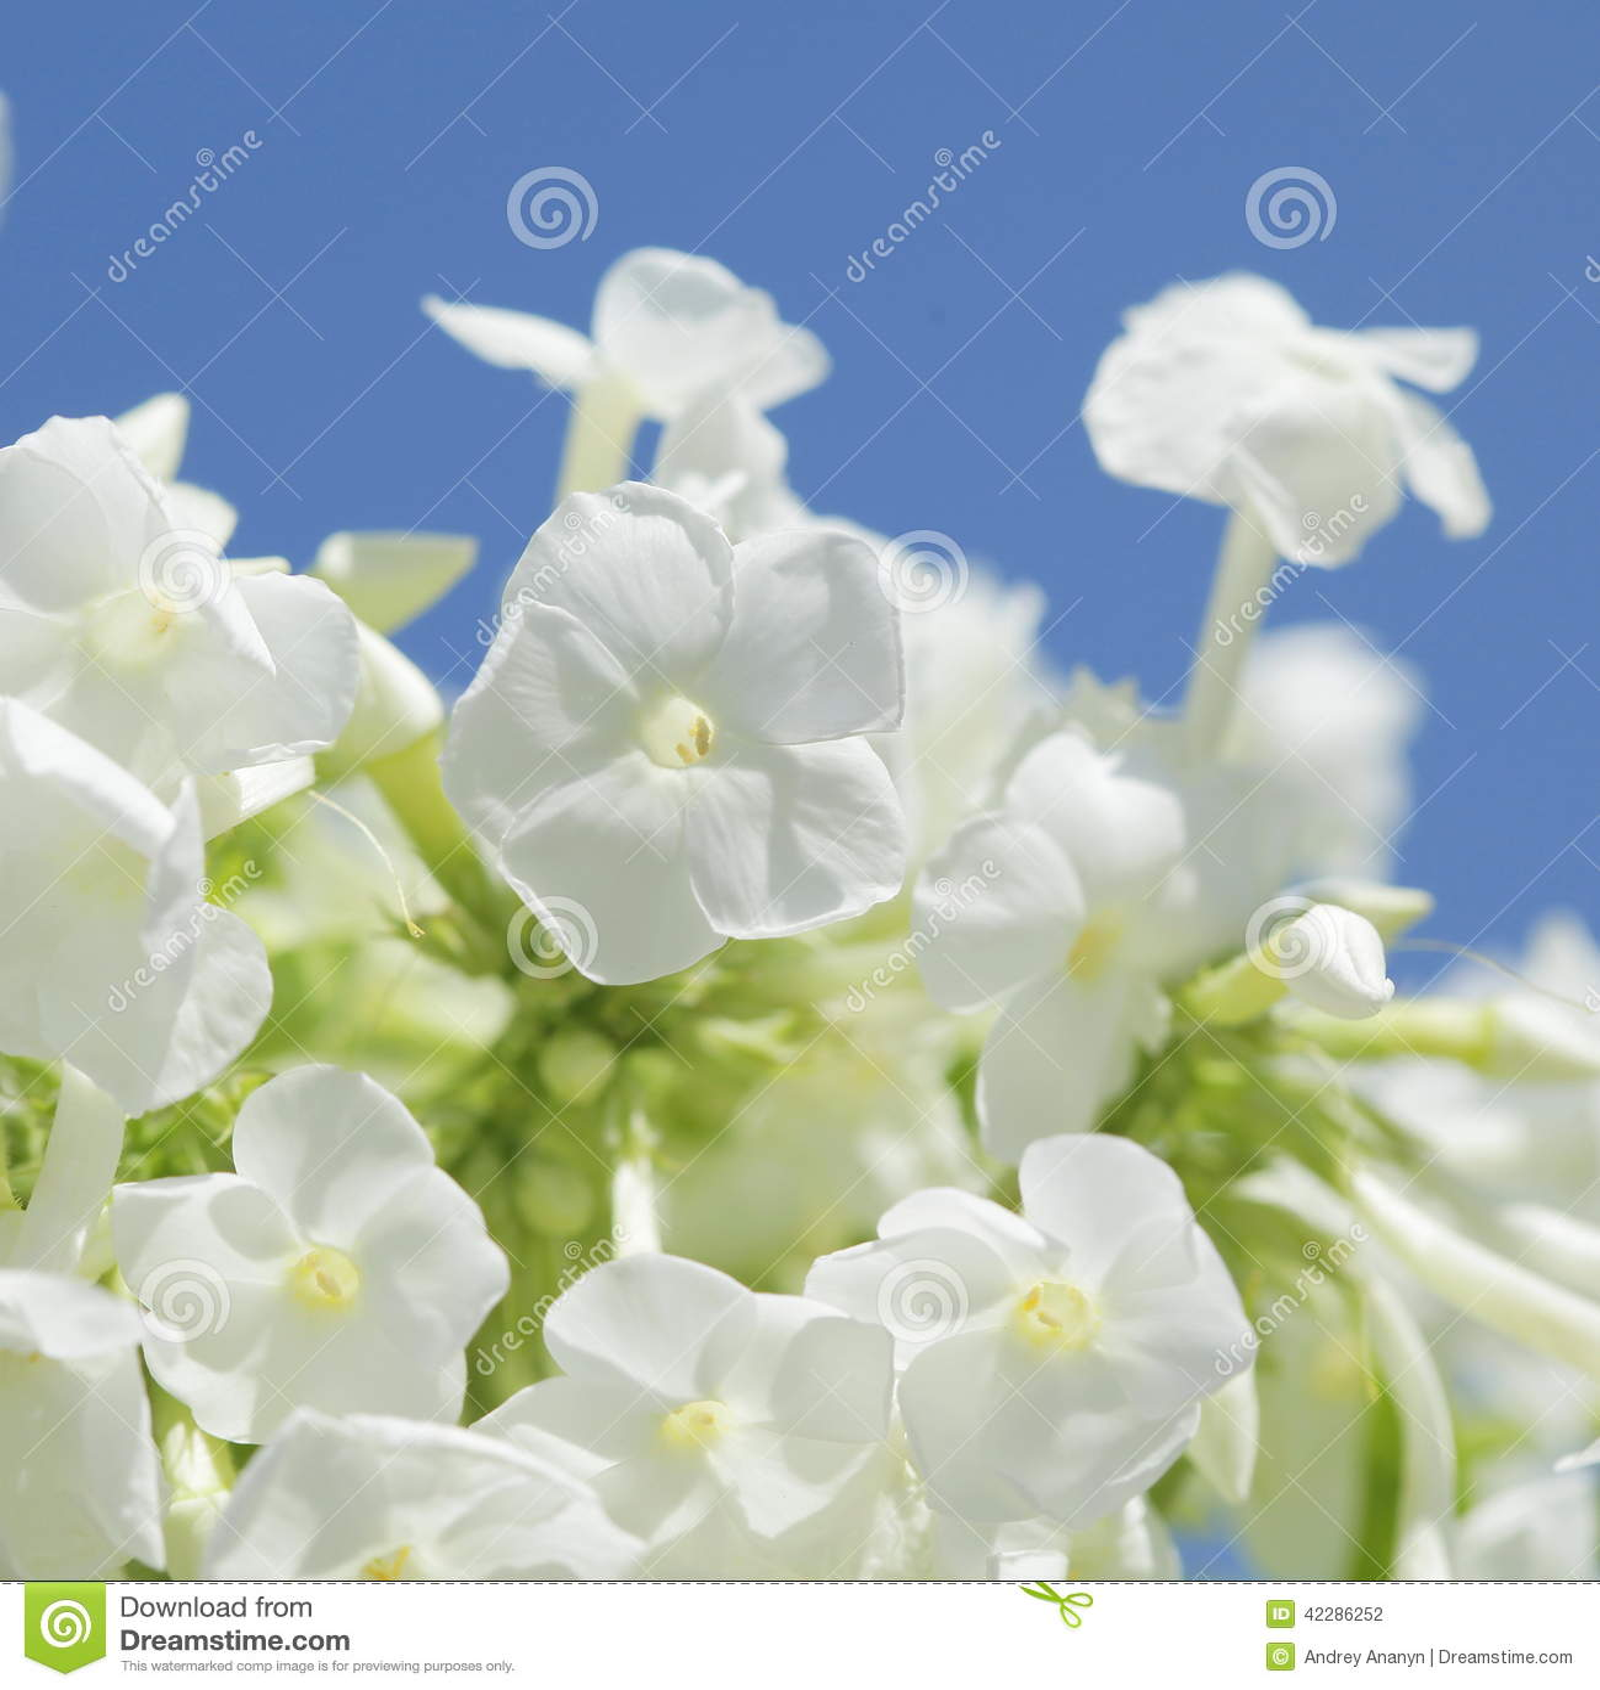 Unusual Beautiful Tender White Flowers Background Stock Photo